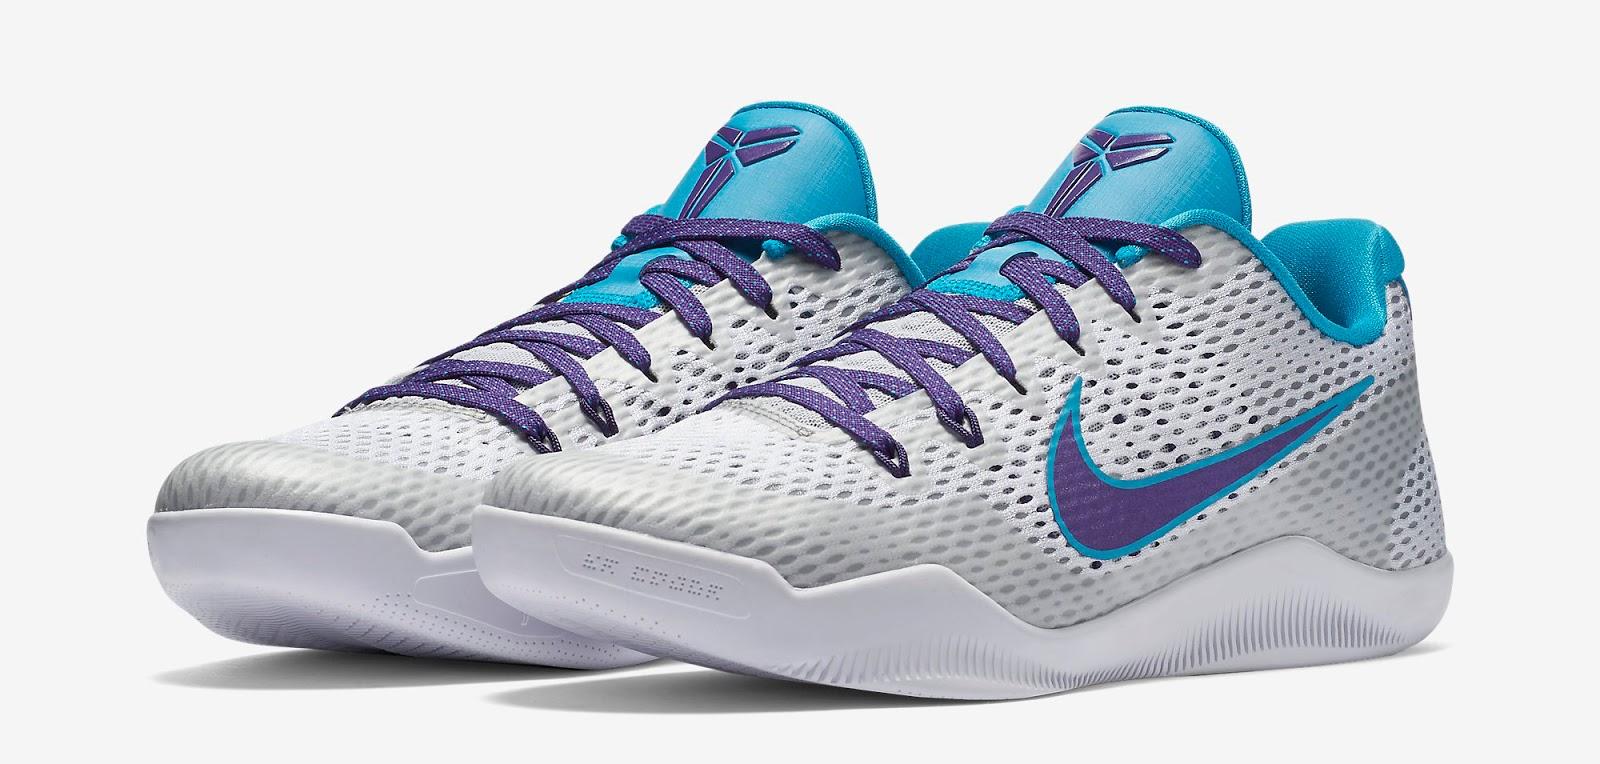 1b2a76b2bb2 Nike Kobe 11